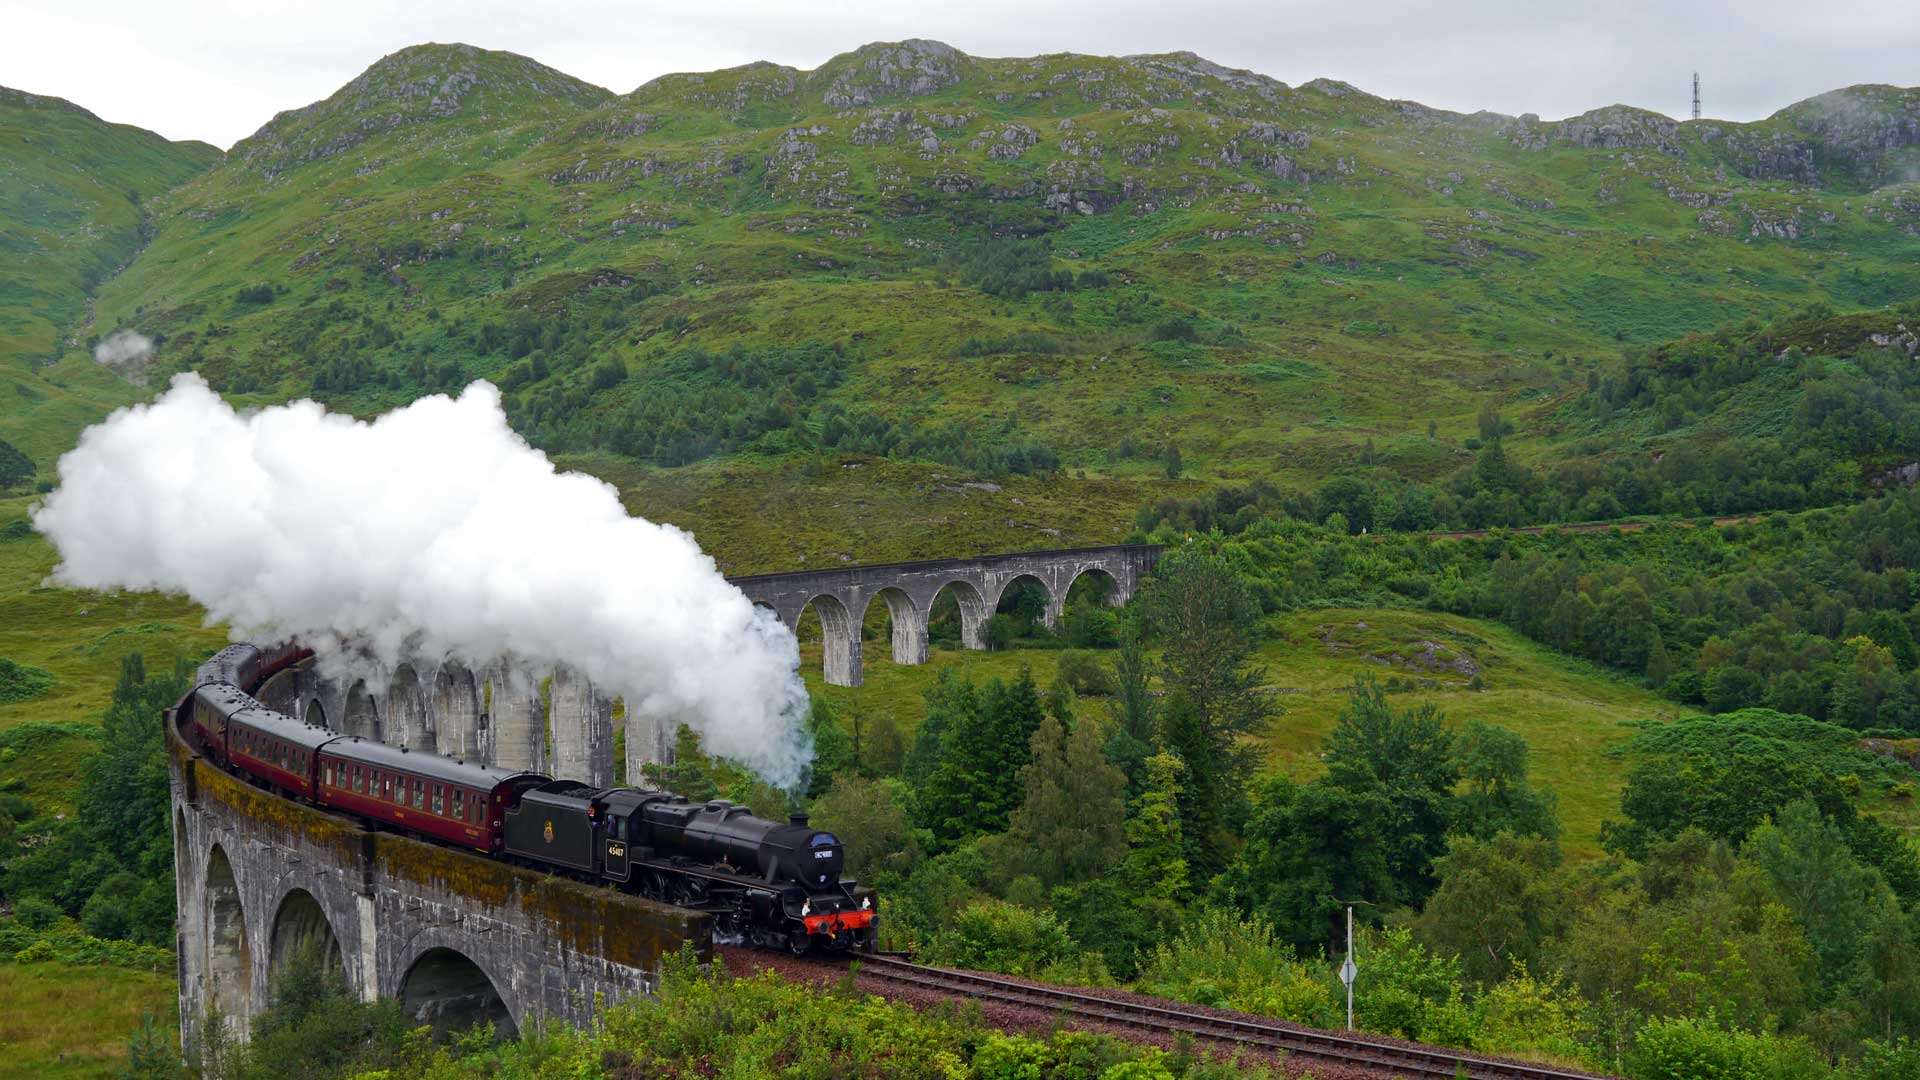 Das berühmte Glenfinnan-Viadukt. Pilgerort für Harry-Potter-Fans. (Foto: Sommerdiebe.de)